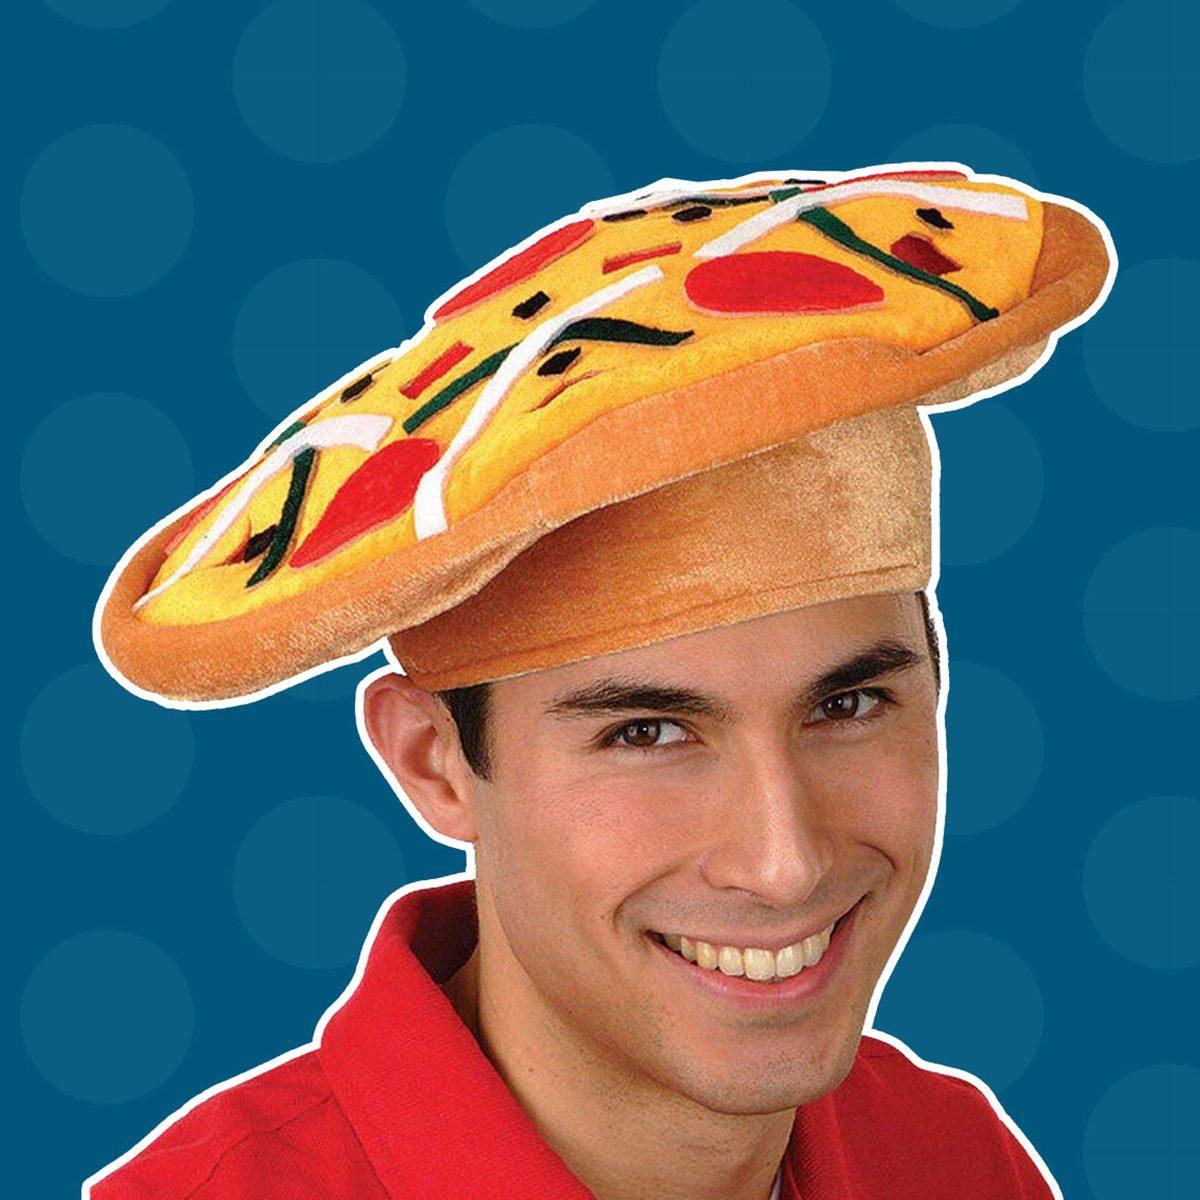 Pizza hat